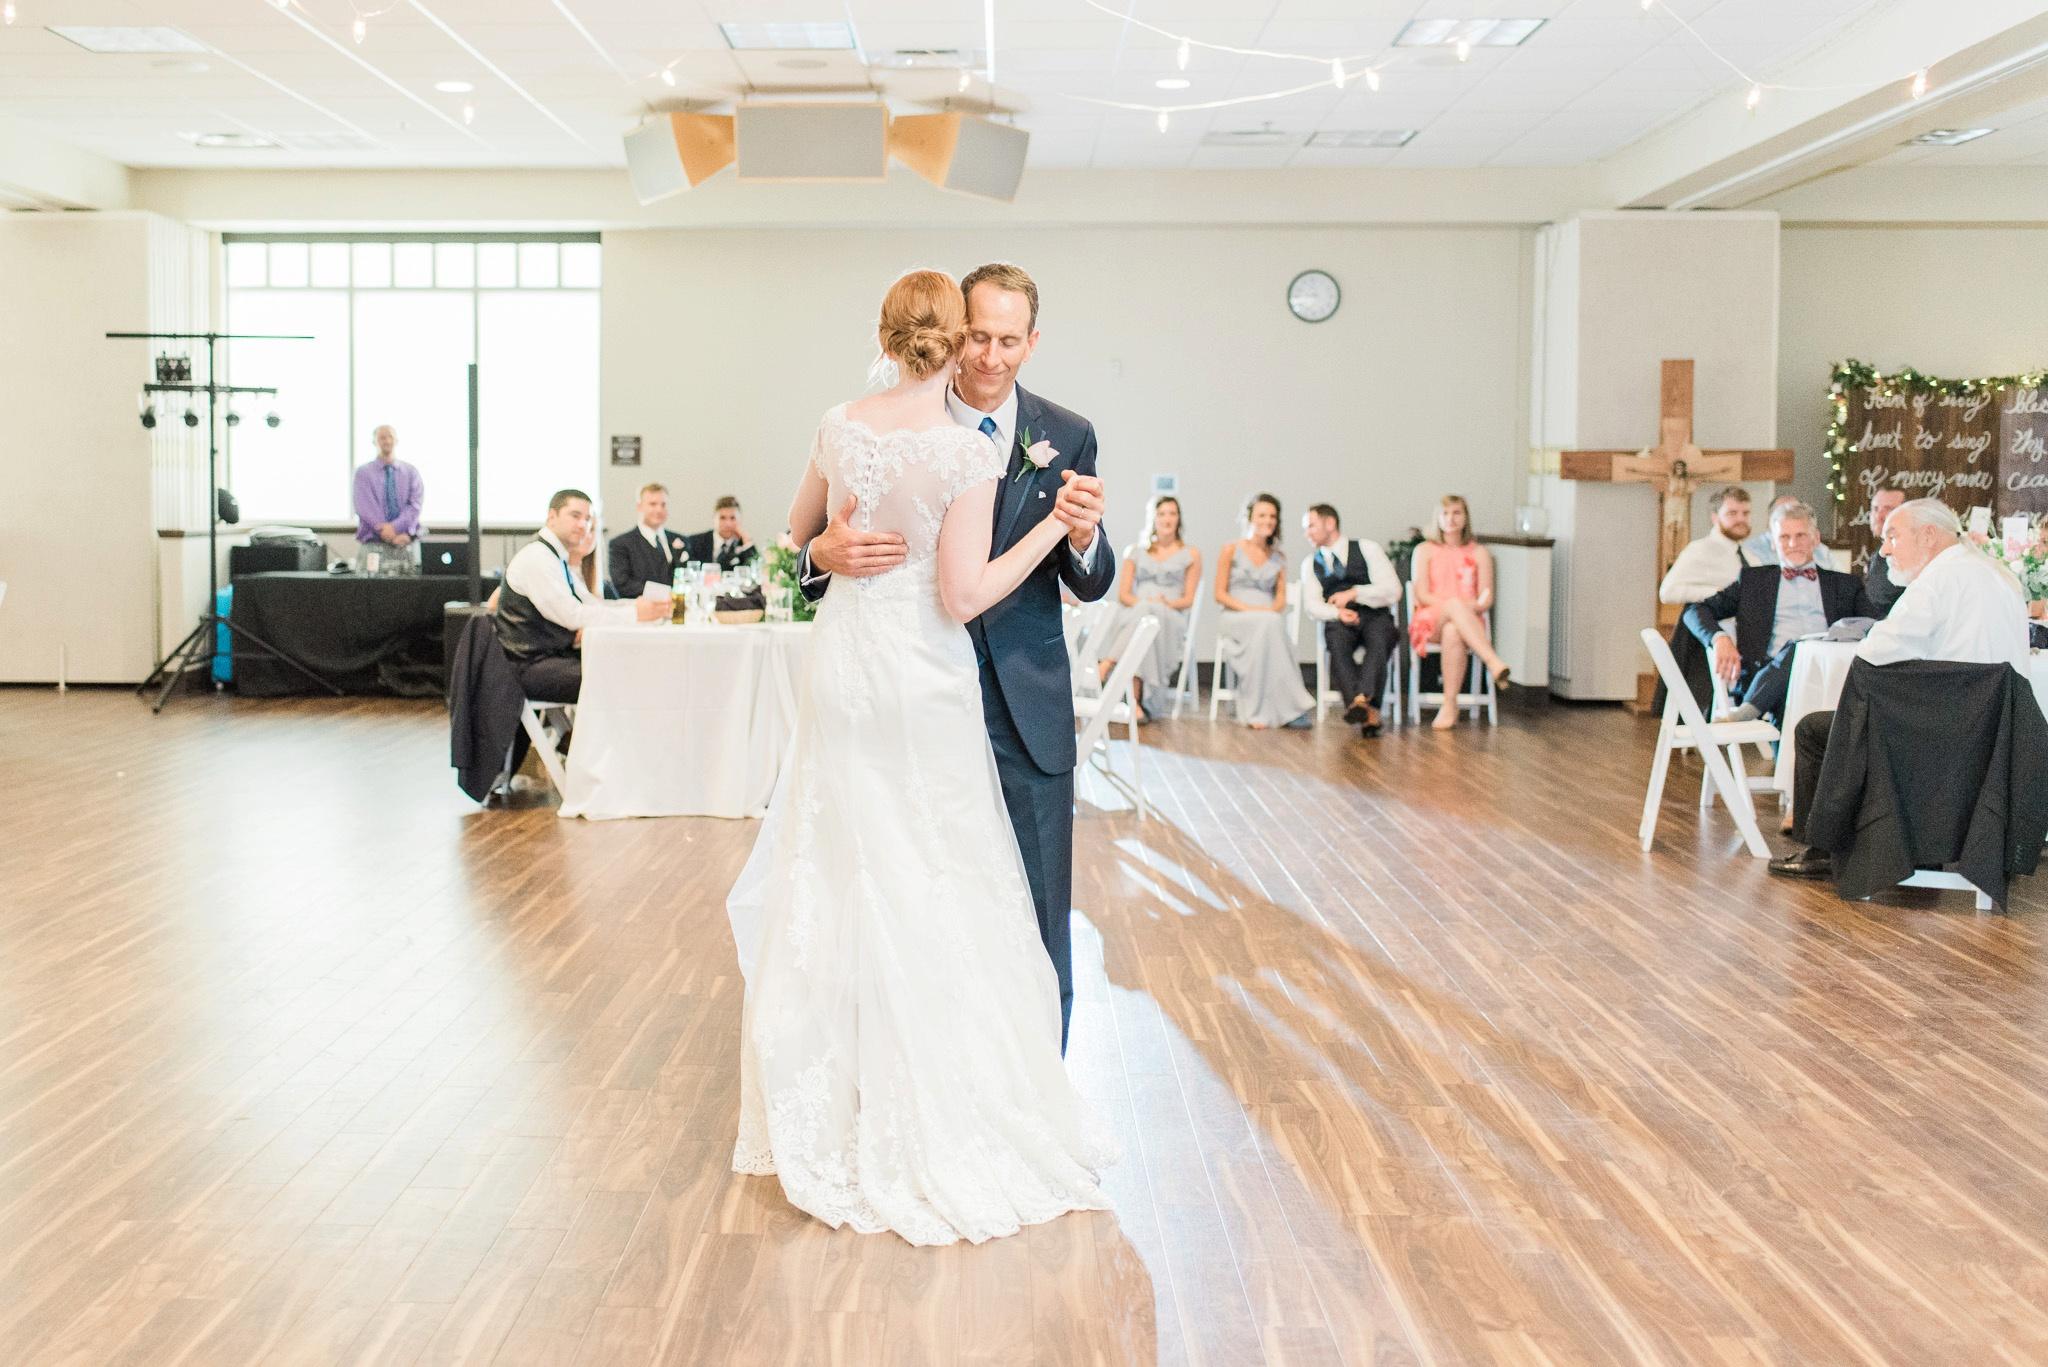 sunbury-ohio-wedding-hannah-johnathan_0141.jpg